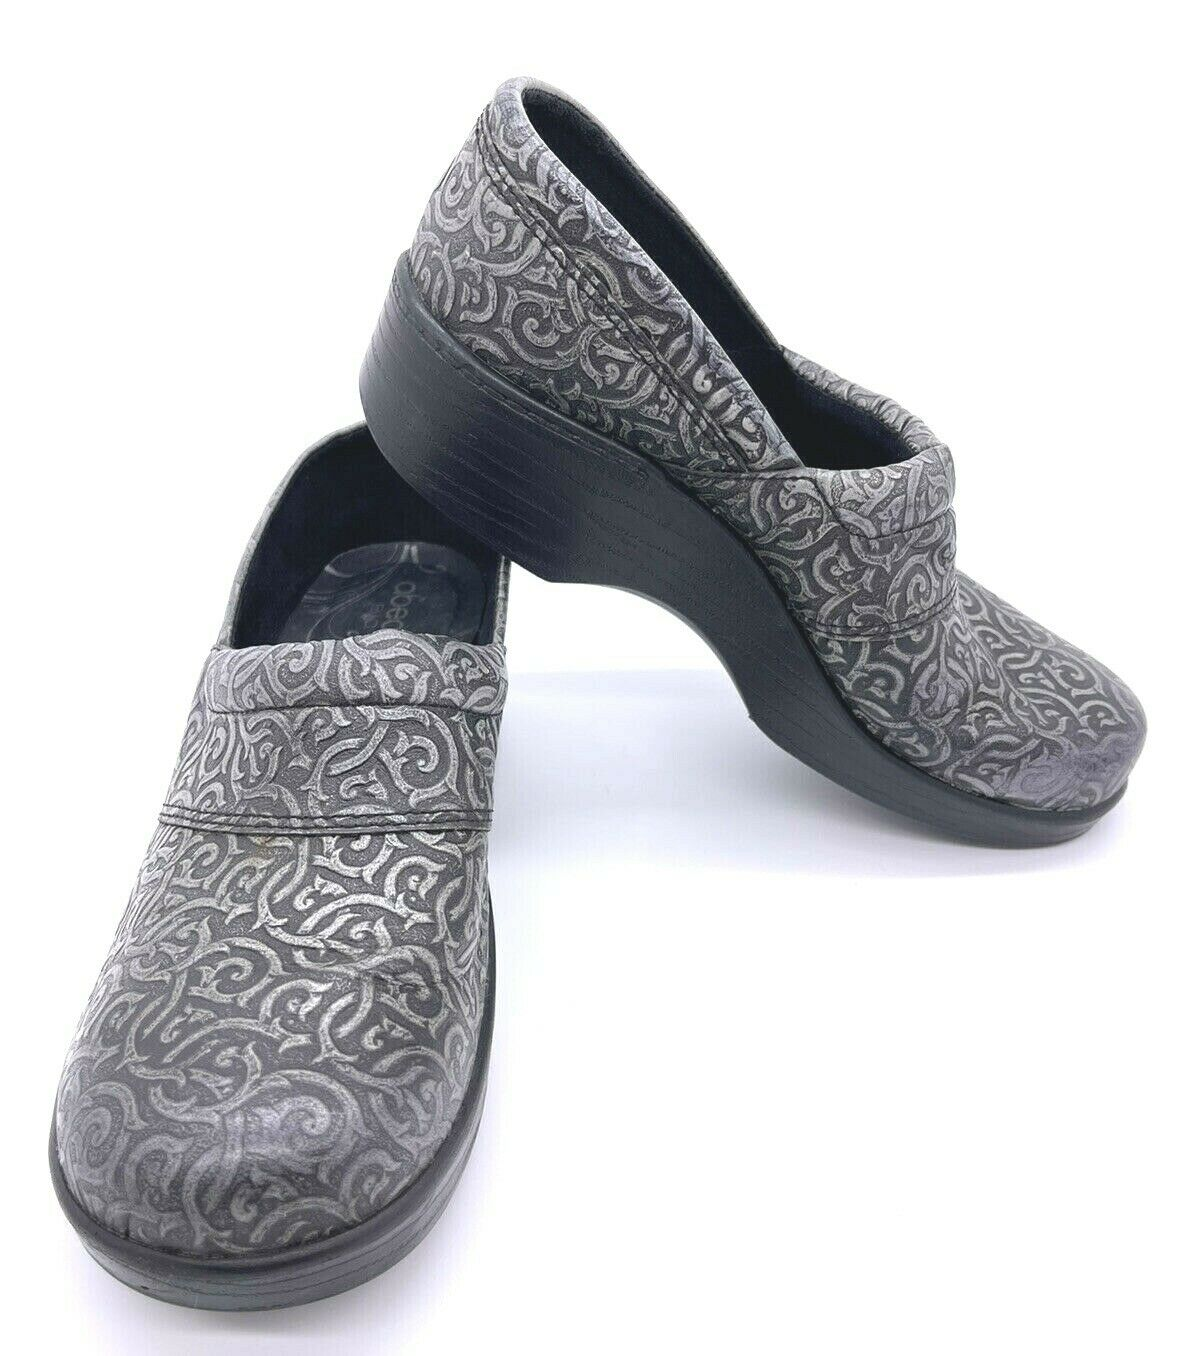 ABEO Women's Flora Black/Silver Embossed Leather Clogs Nursing Shoes Sz 8.5 N